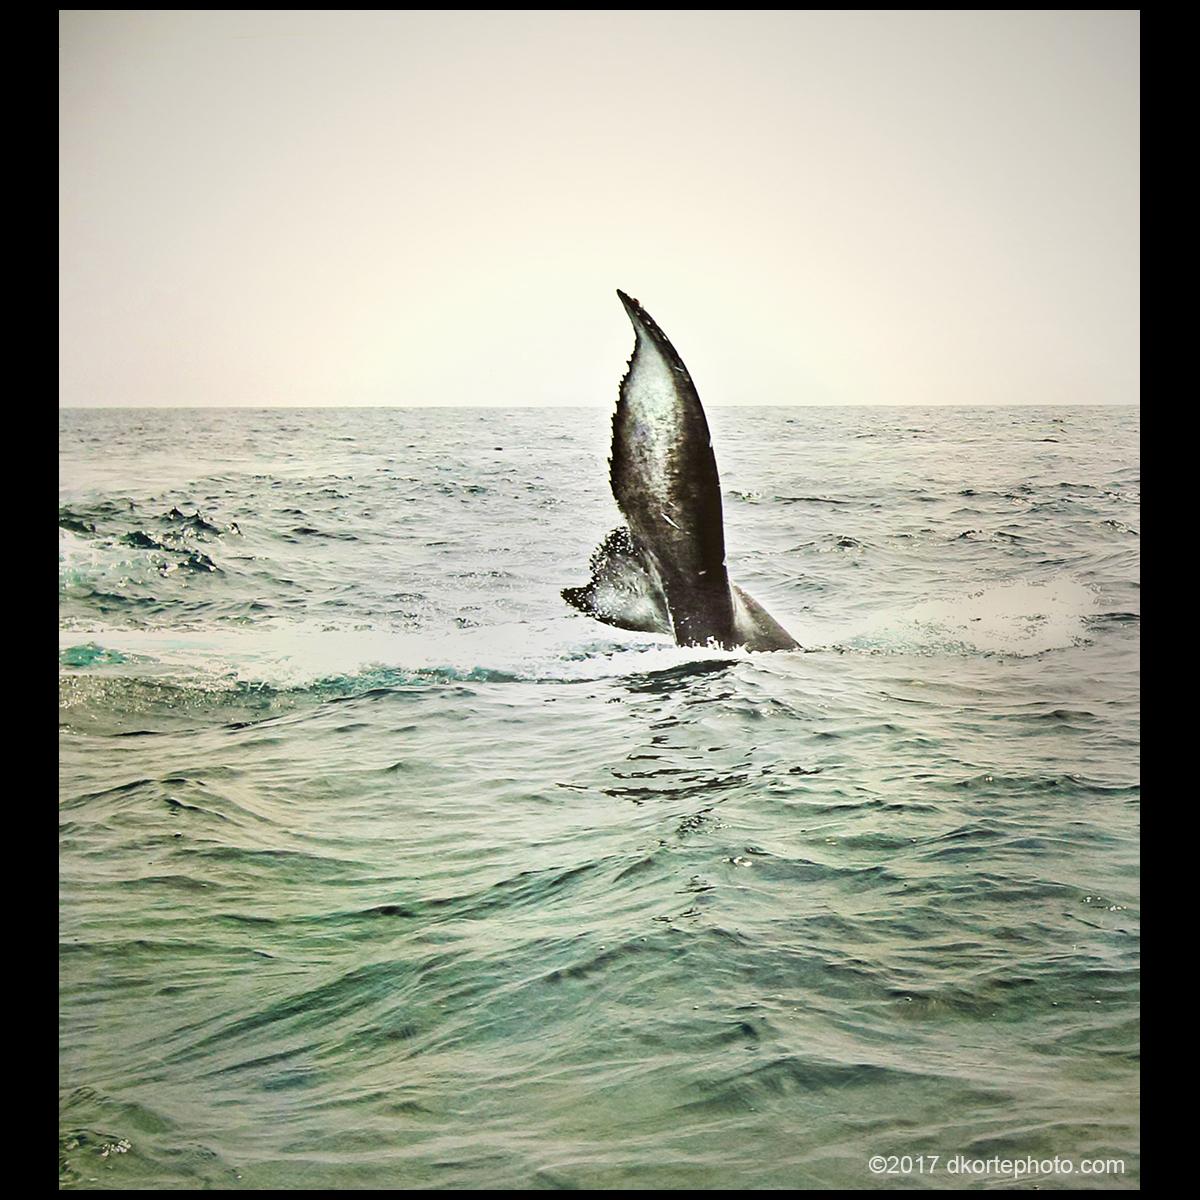 whaleTail_1200_DKorte